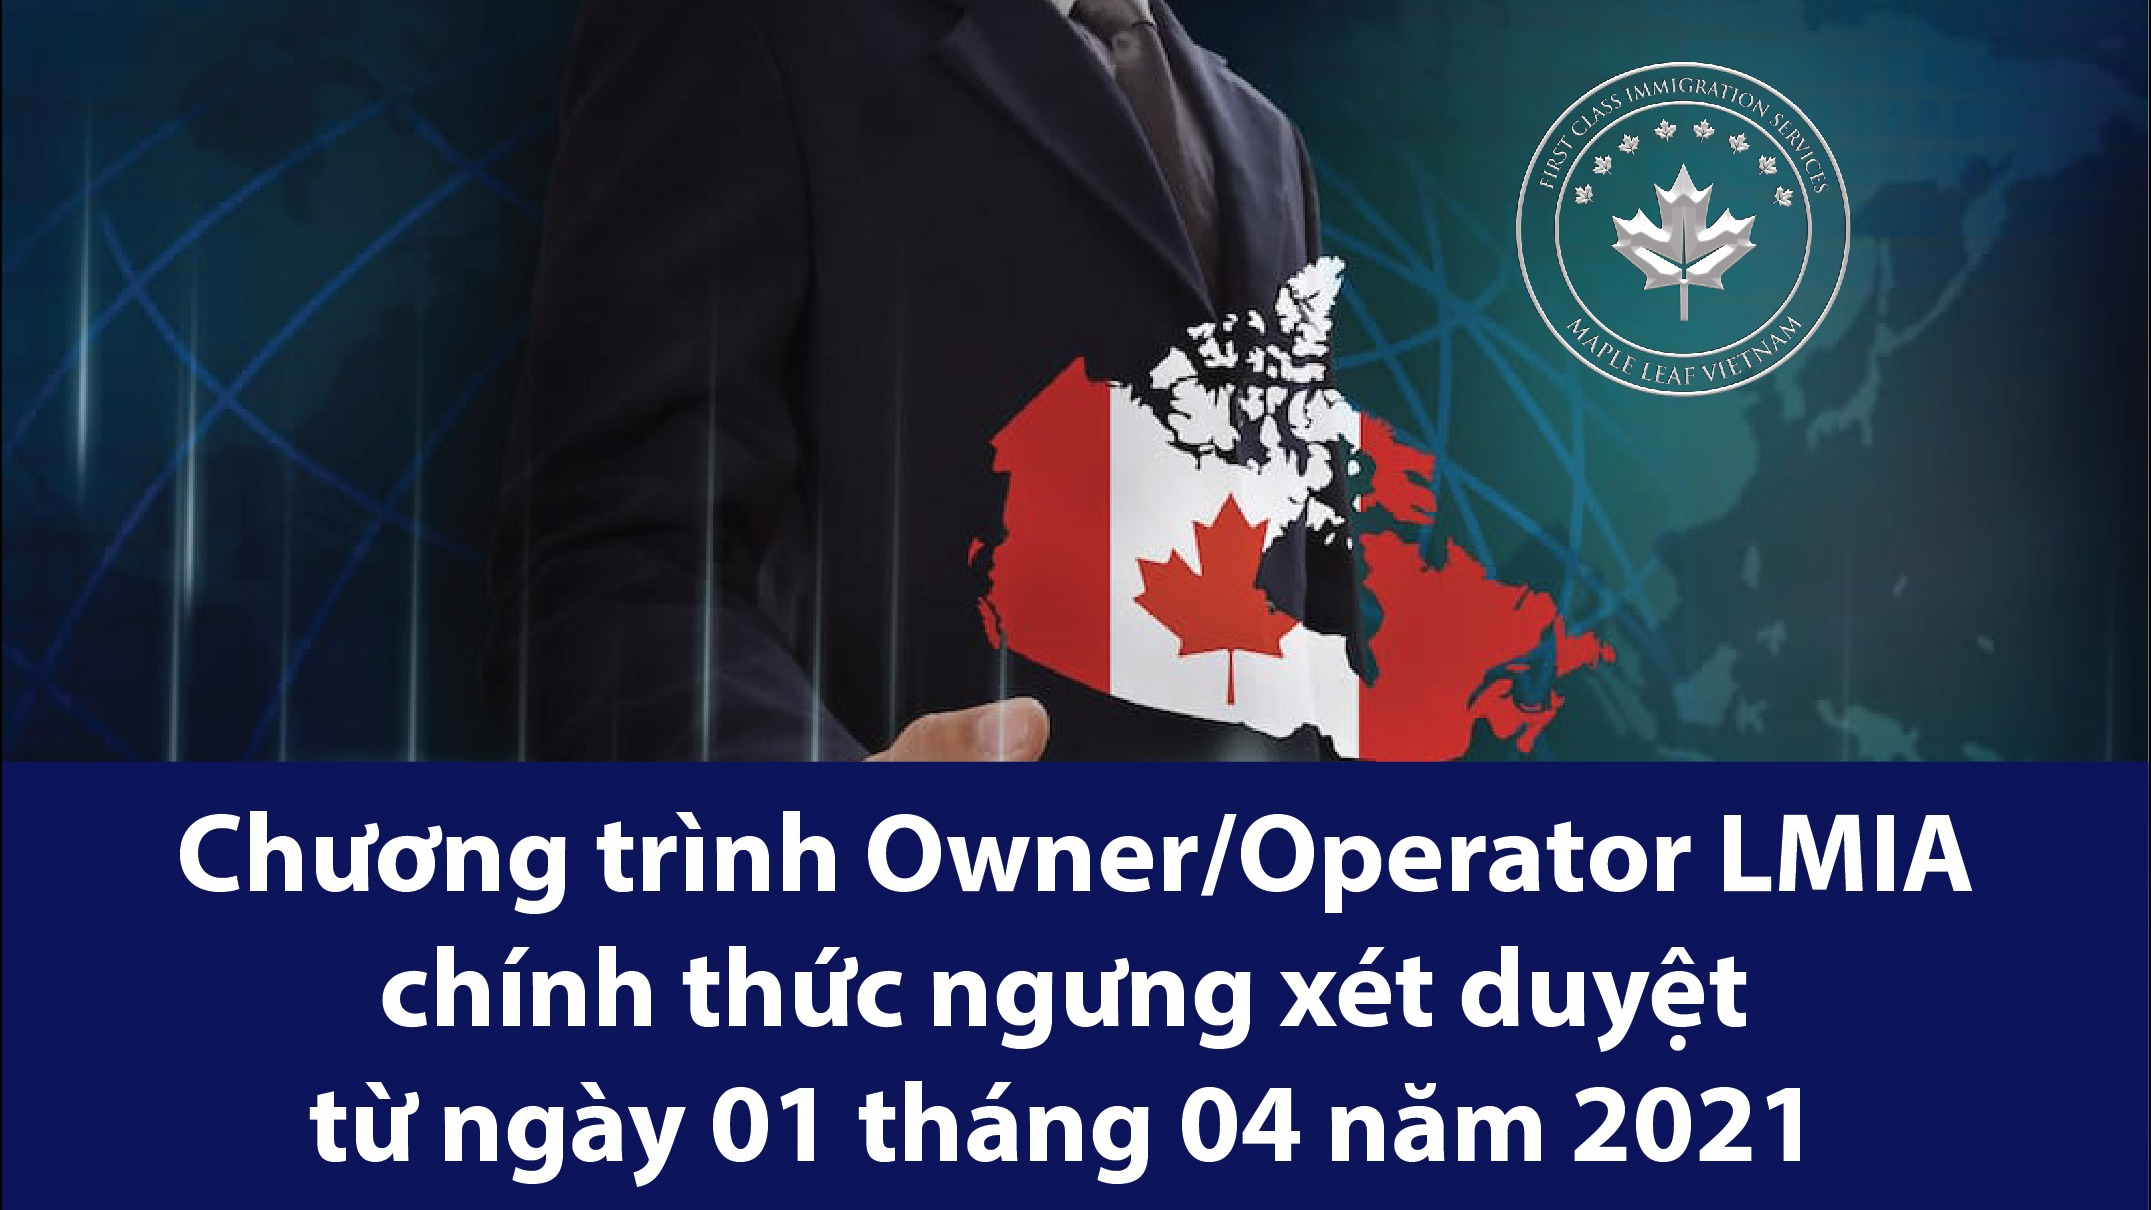 chuong-trinh-owner-operator-lmia-chinh-thuc-ngung-xet-duyet-ke-tu-ngay-01-thang-04-nam-2021